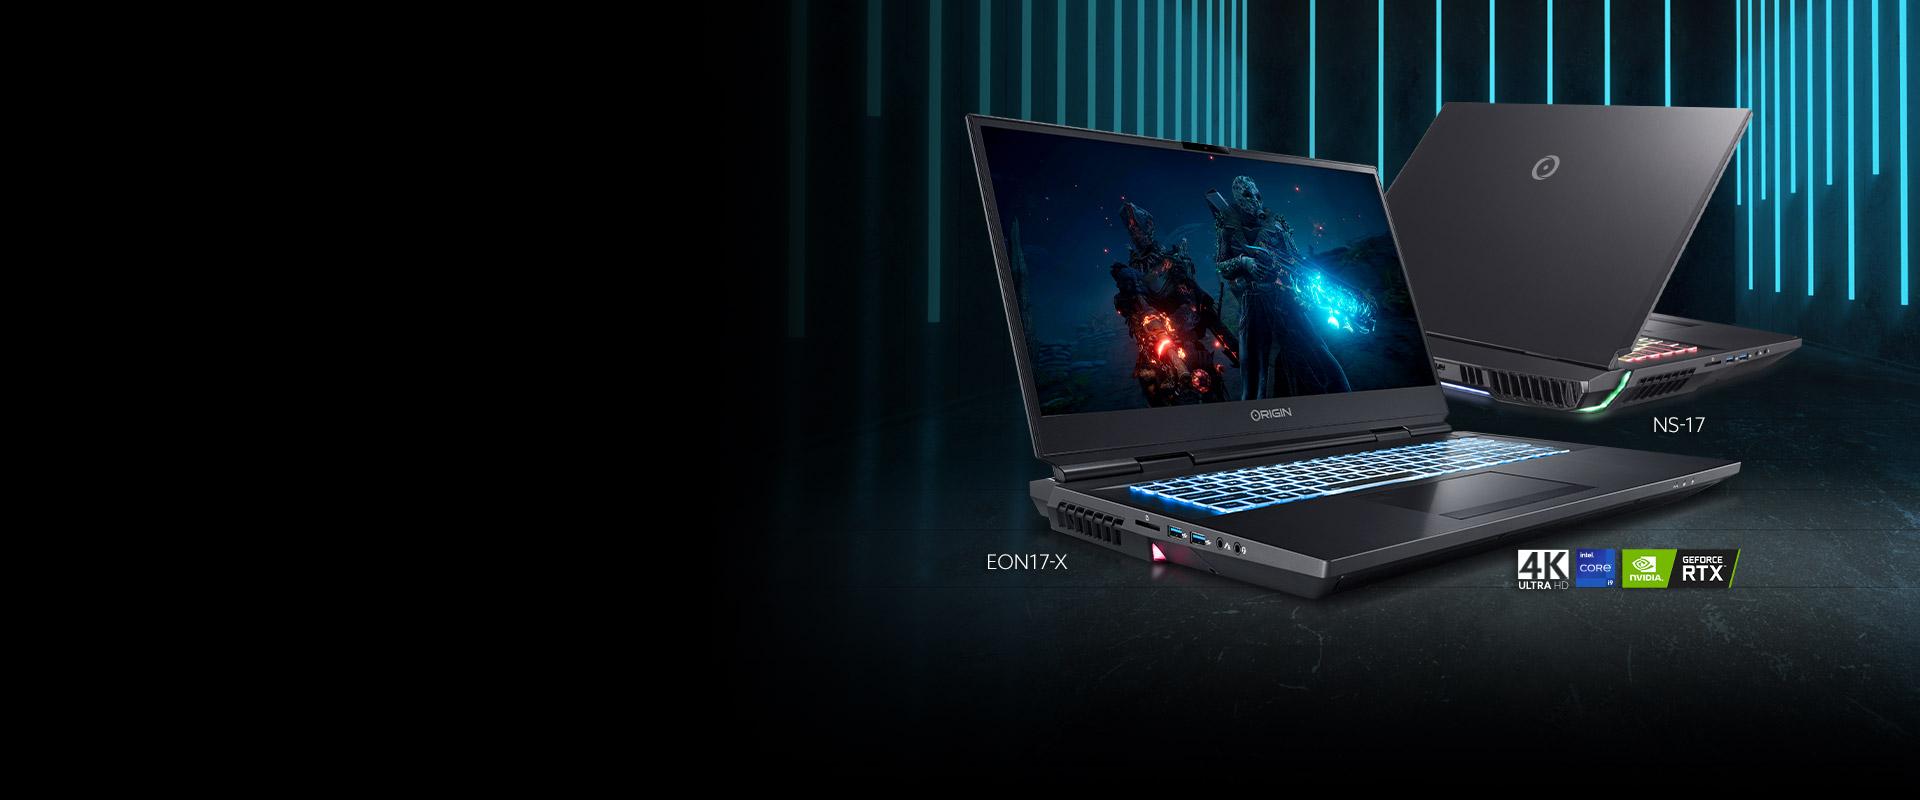 17-inch gaming laptop with desktop CPU and GPU